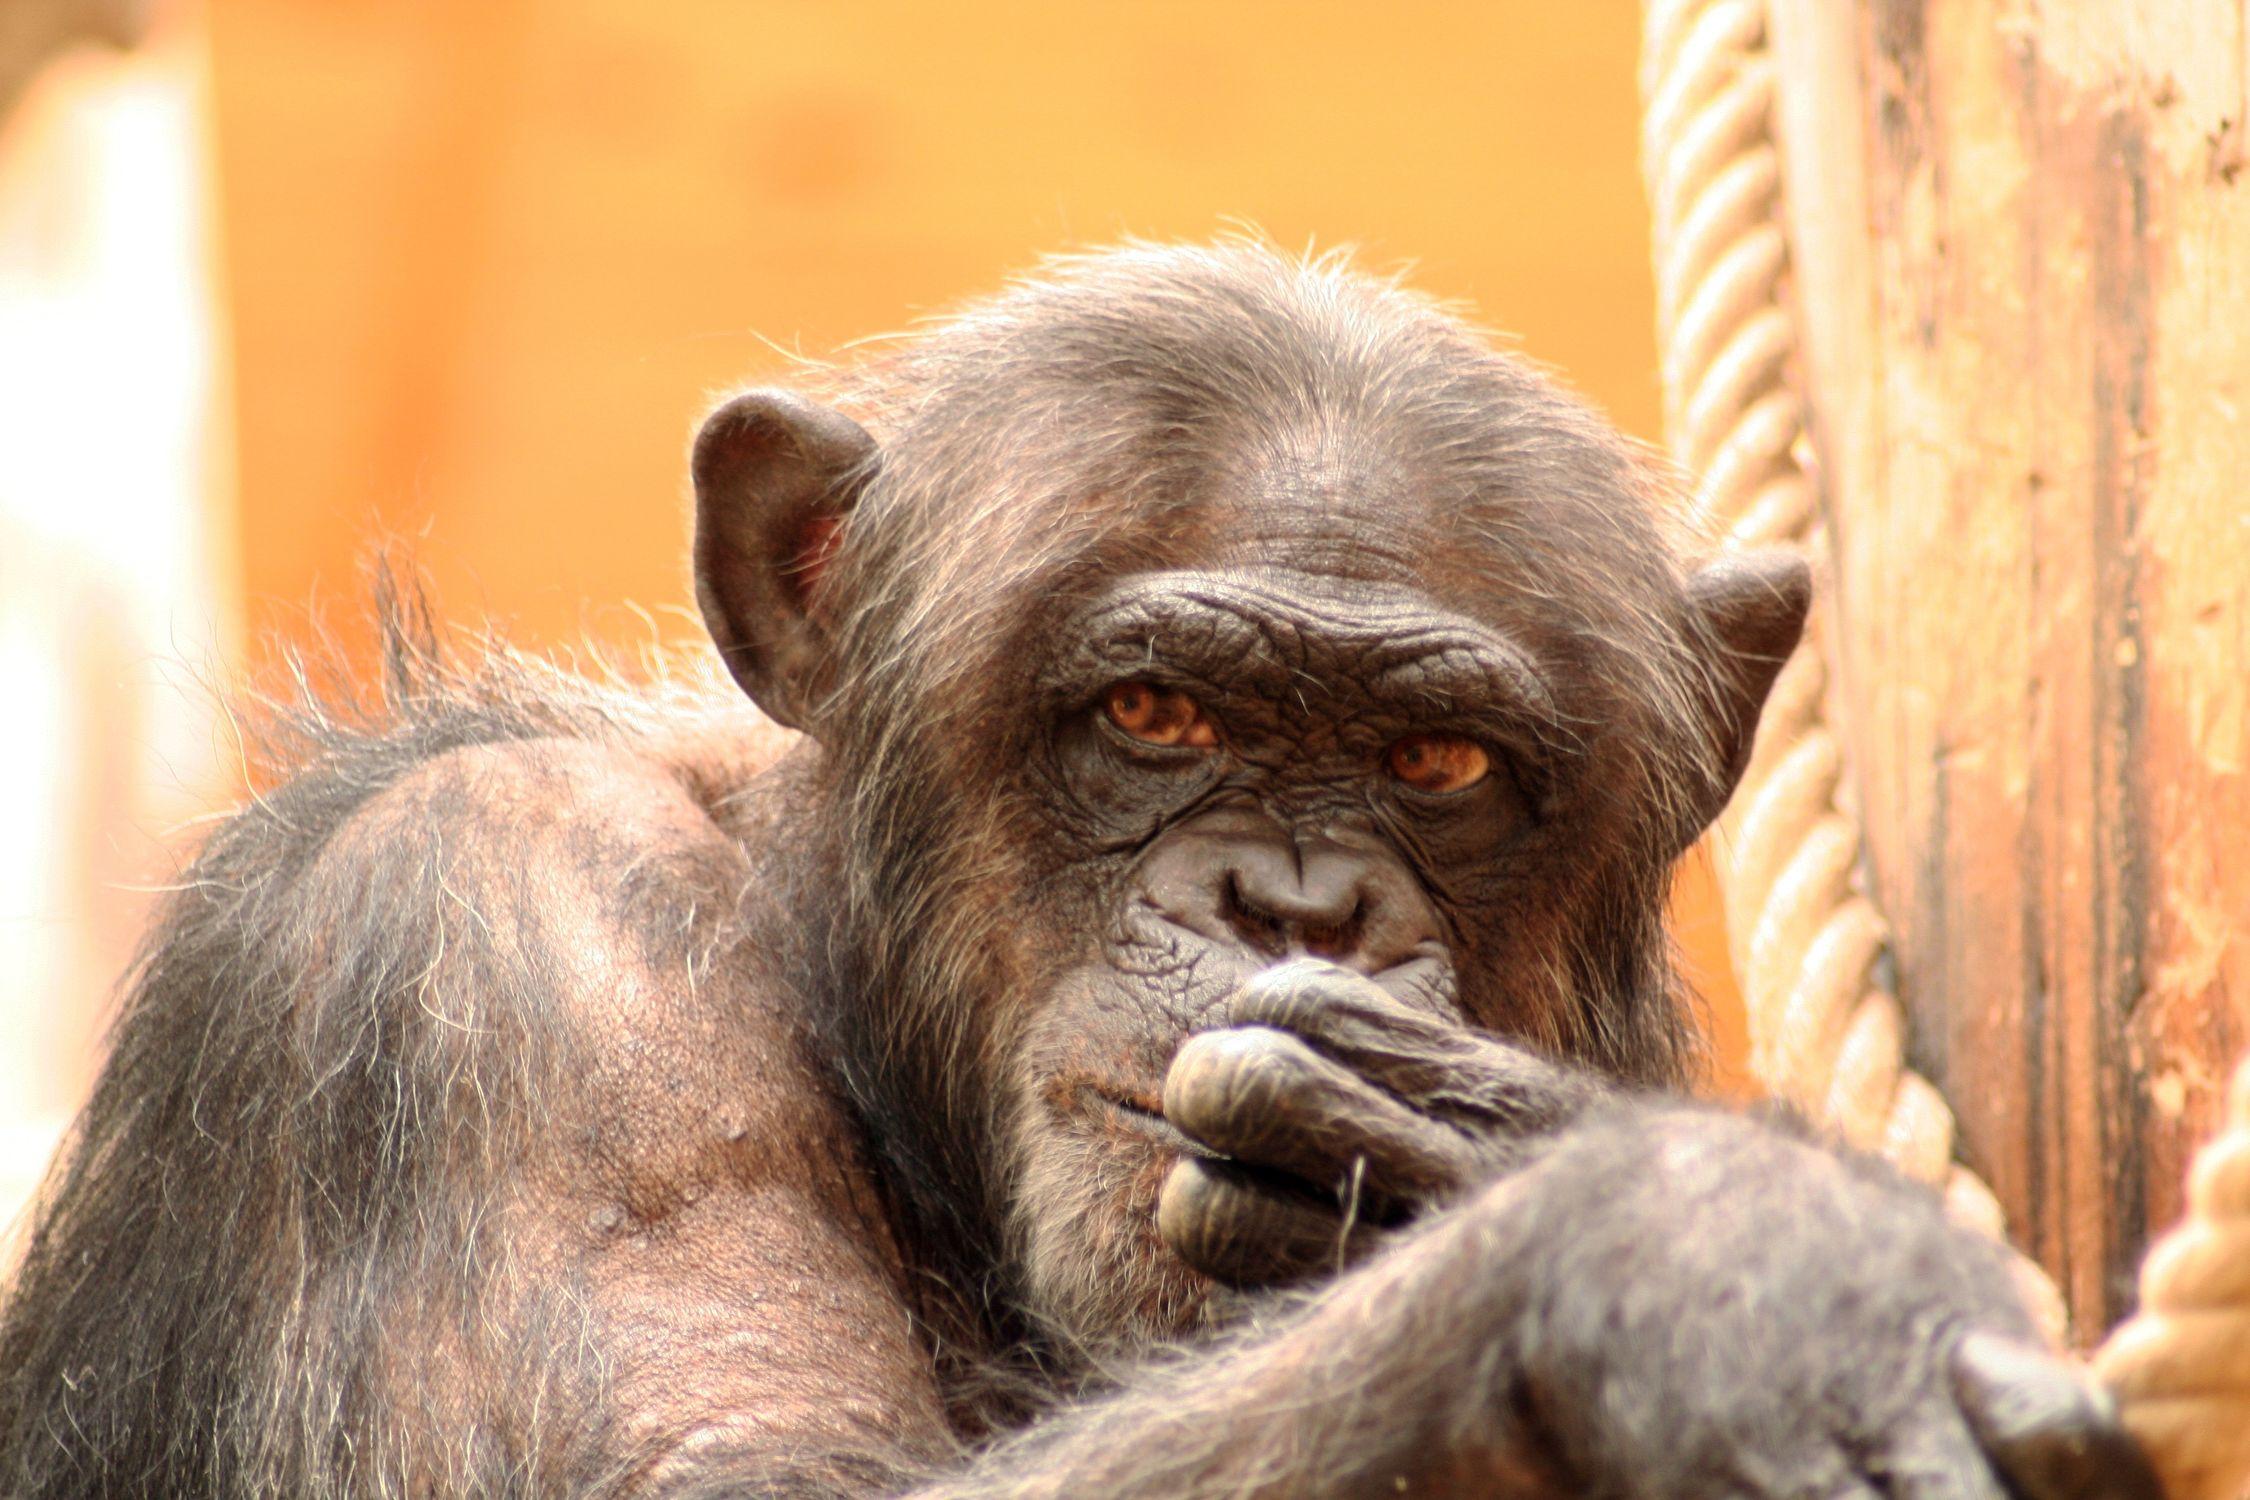 Bild mit Tiere, Säugetiere, Primaten, Menschen, Körperteile, Köpfe, Augen, Haut, Orte, Parks, Zoos, Menschenaffen, Schimpansen, Makaken, Affe, Tier, Bonobo, Zwergschimpanse, Hominidae, Pan troglodytes, Pan paniscus, Affen, Orang Utans